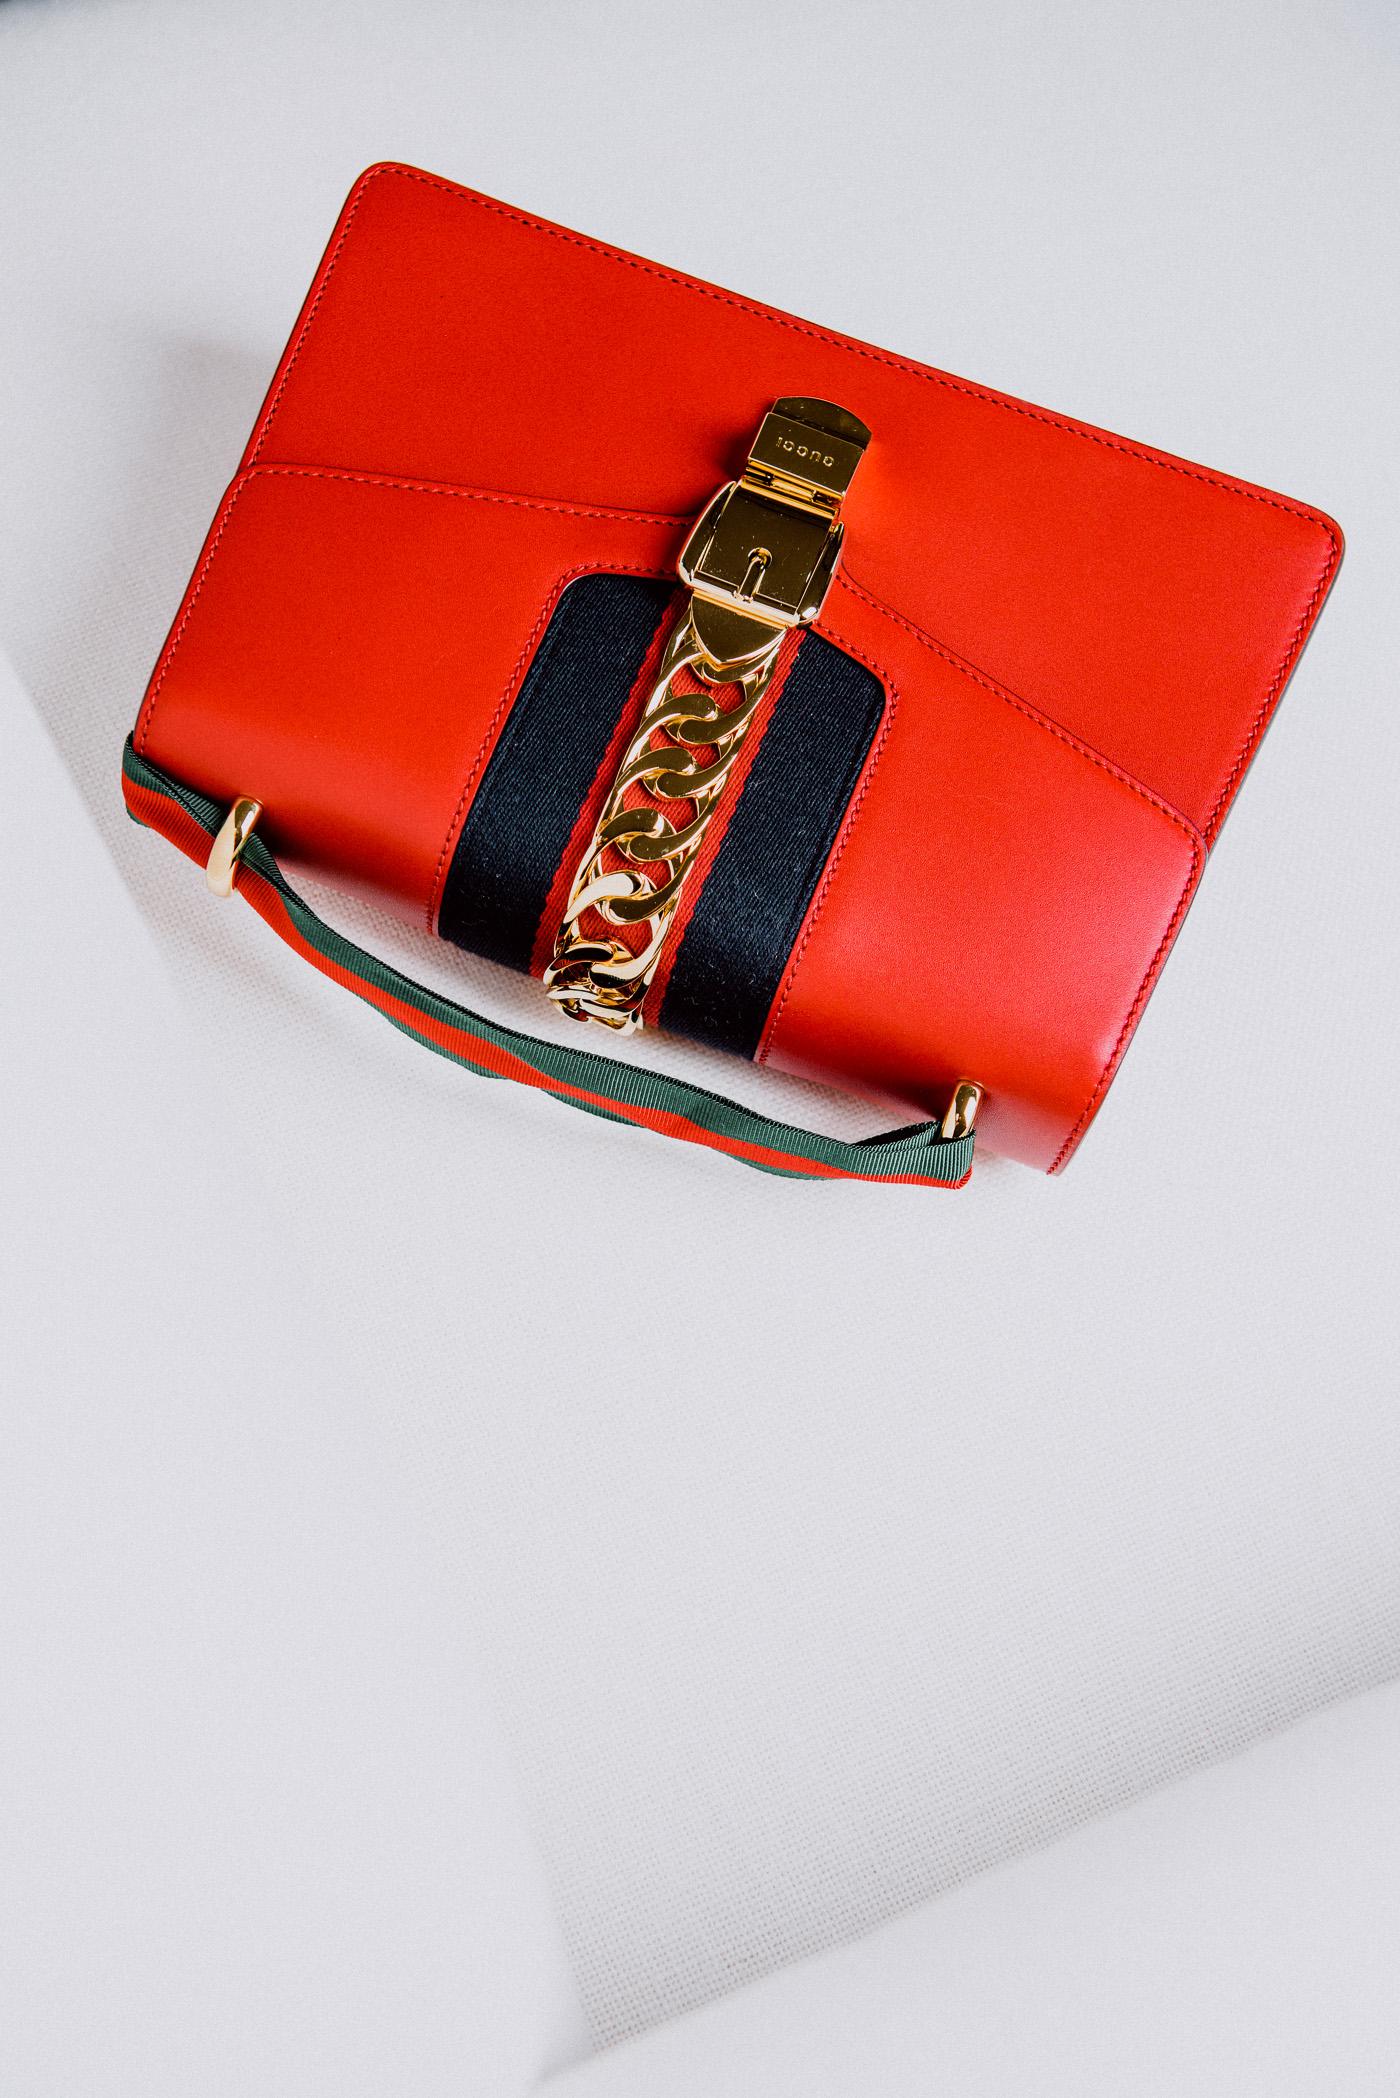 Gucci Sylvie Bag in Red, $2,490 via Gucci